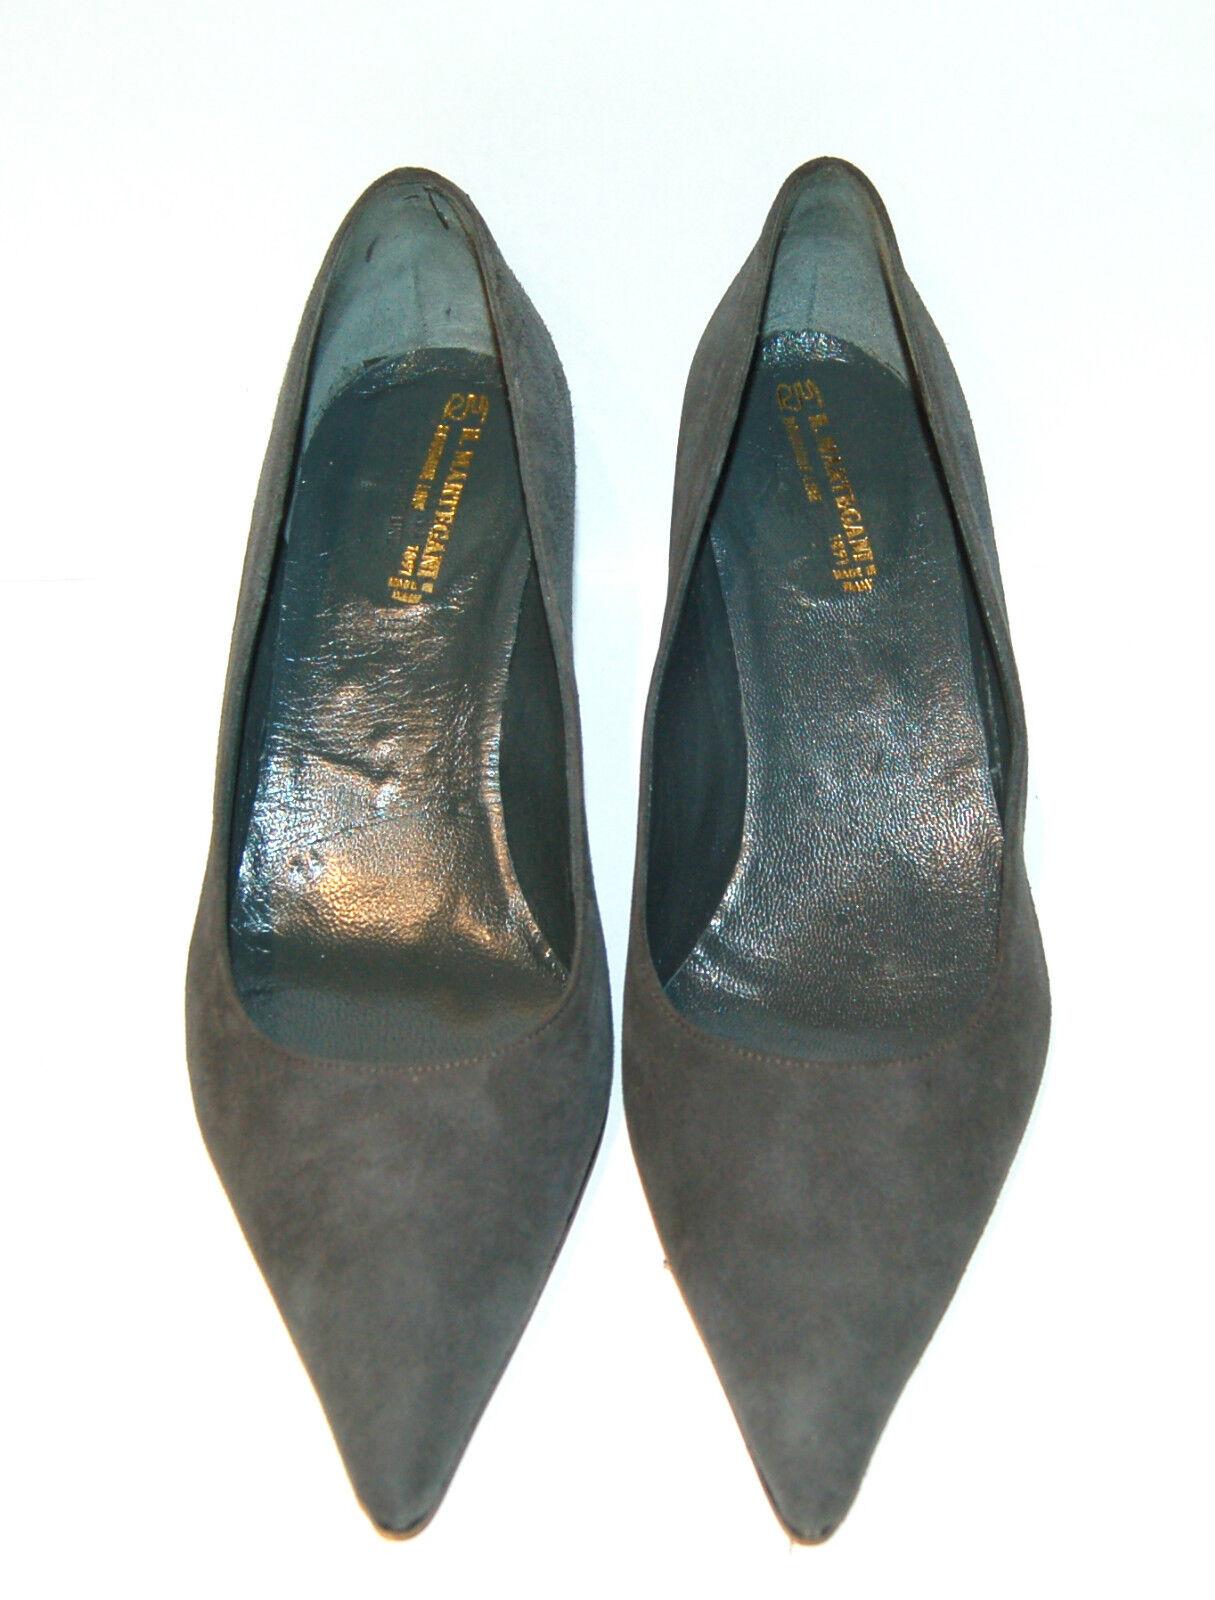 39½ eu - - - WOMAN POINTED PUMP - grau SUEDE - LEATHER SOLE - HEEL 5,5cm 6fa59c